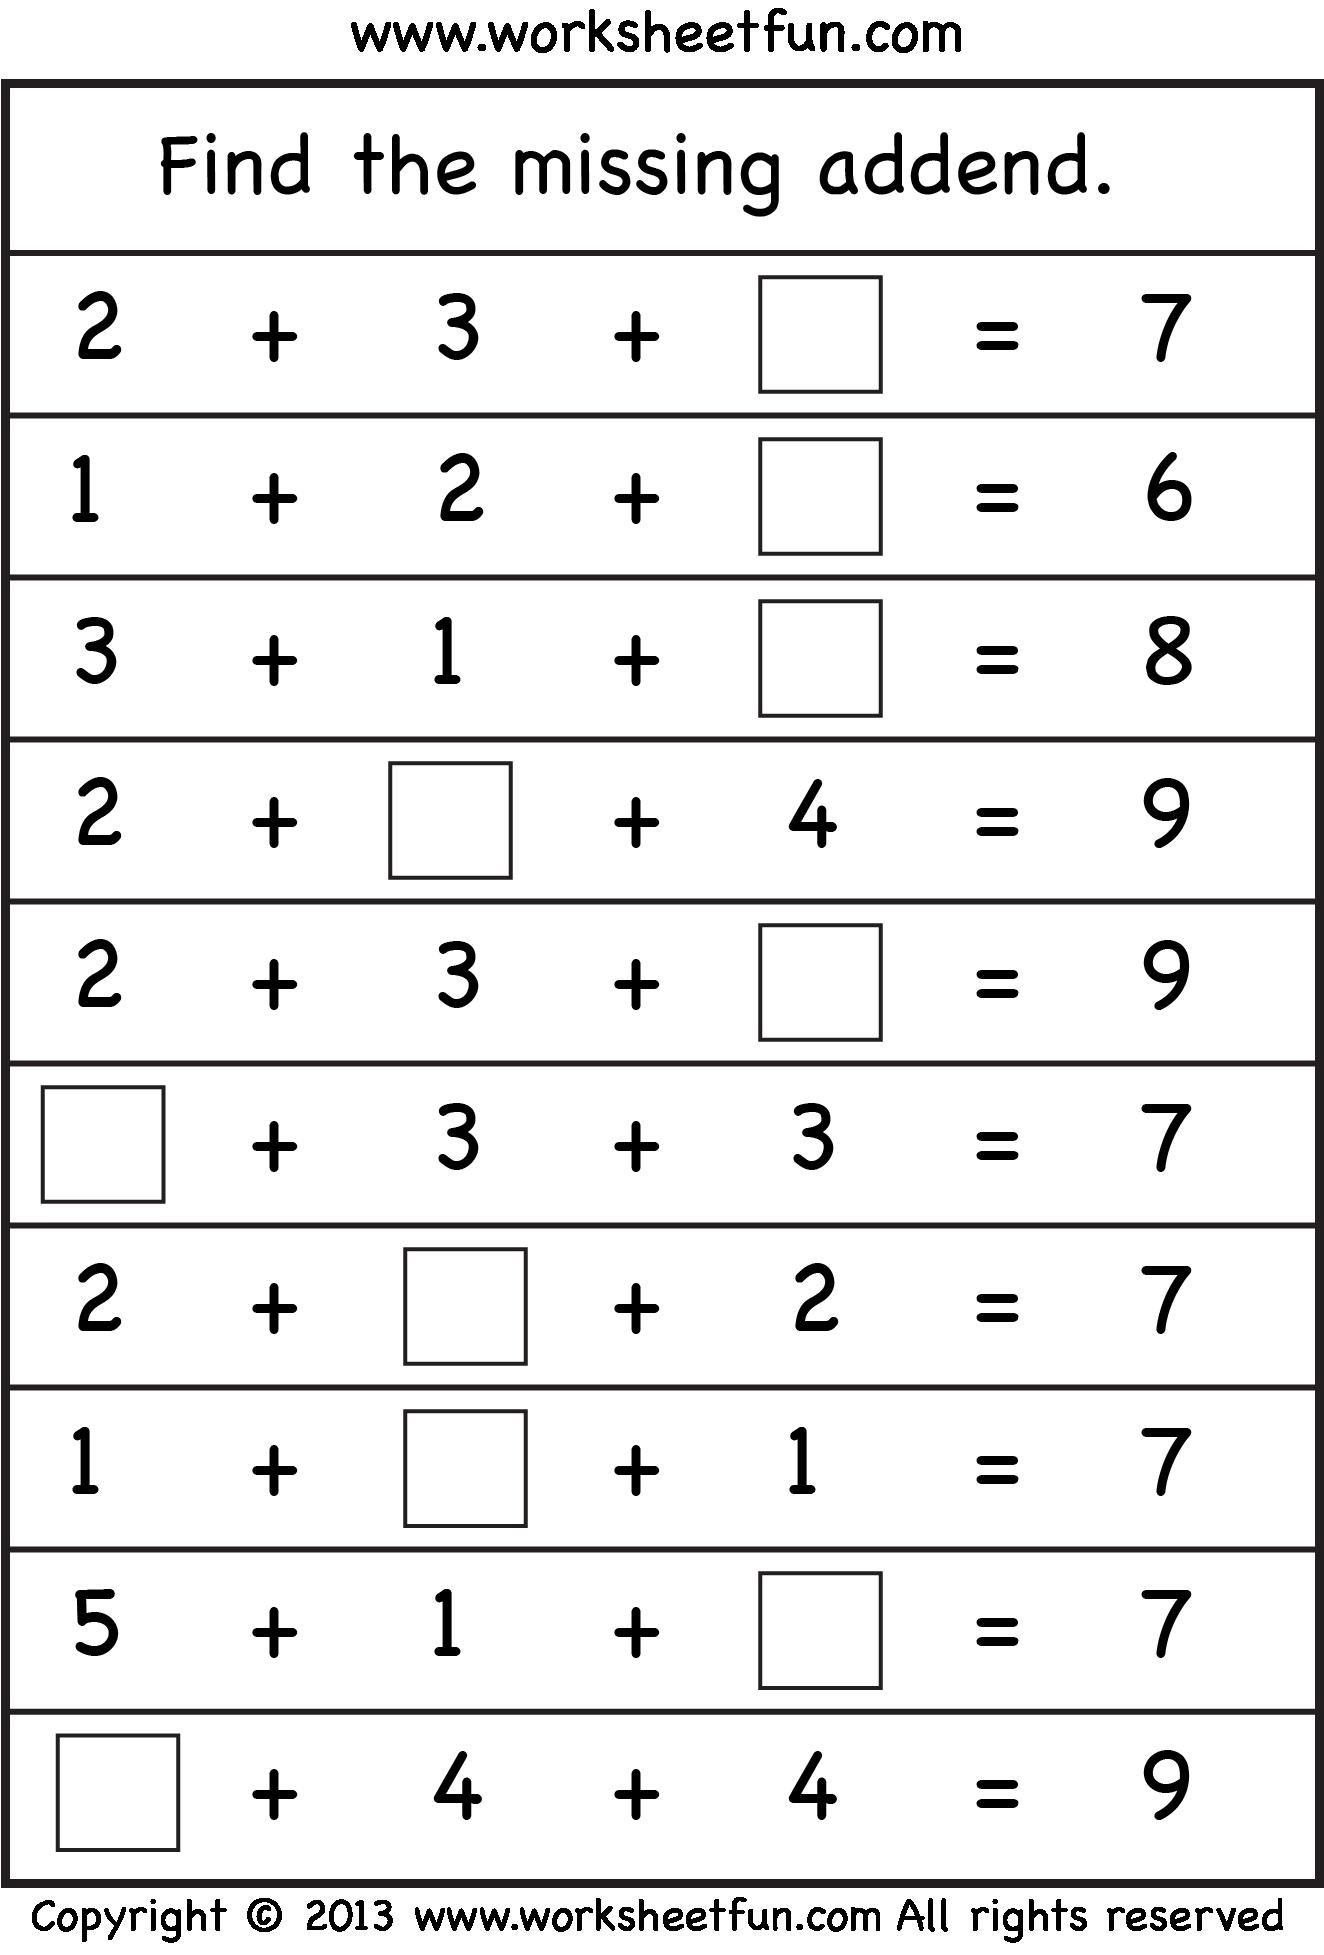 missing-addend-level2-W1-.png (1324×1955)   Mental maths worksheets [ 1955 x 1324 Pixel ]